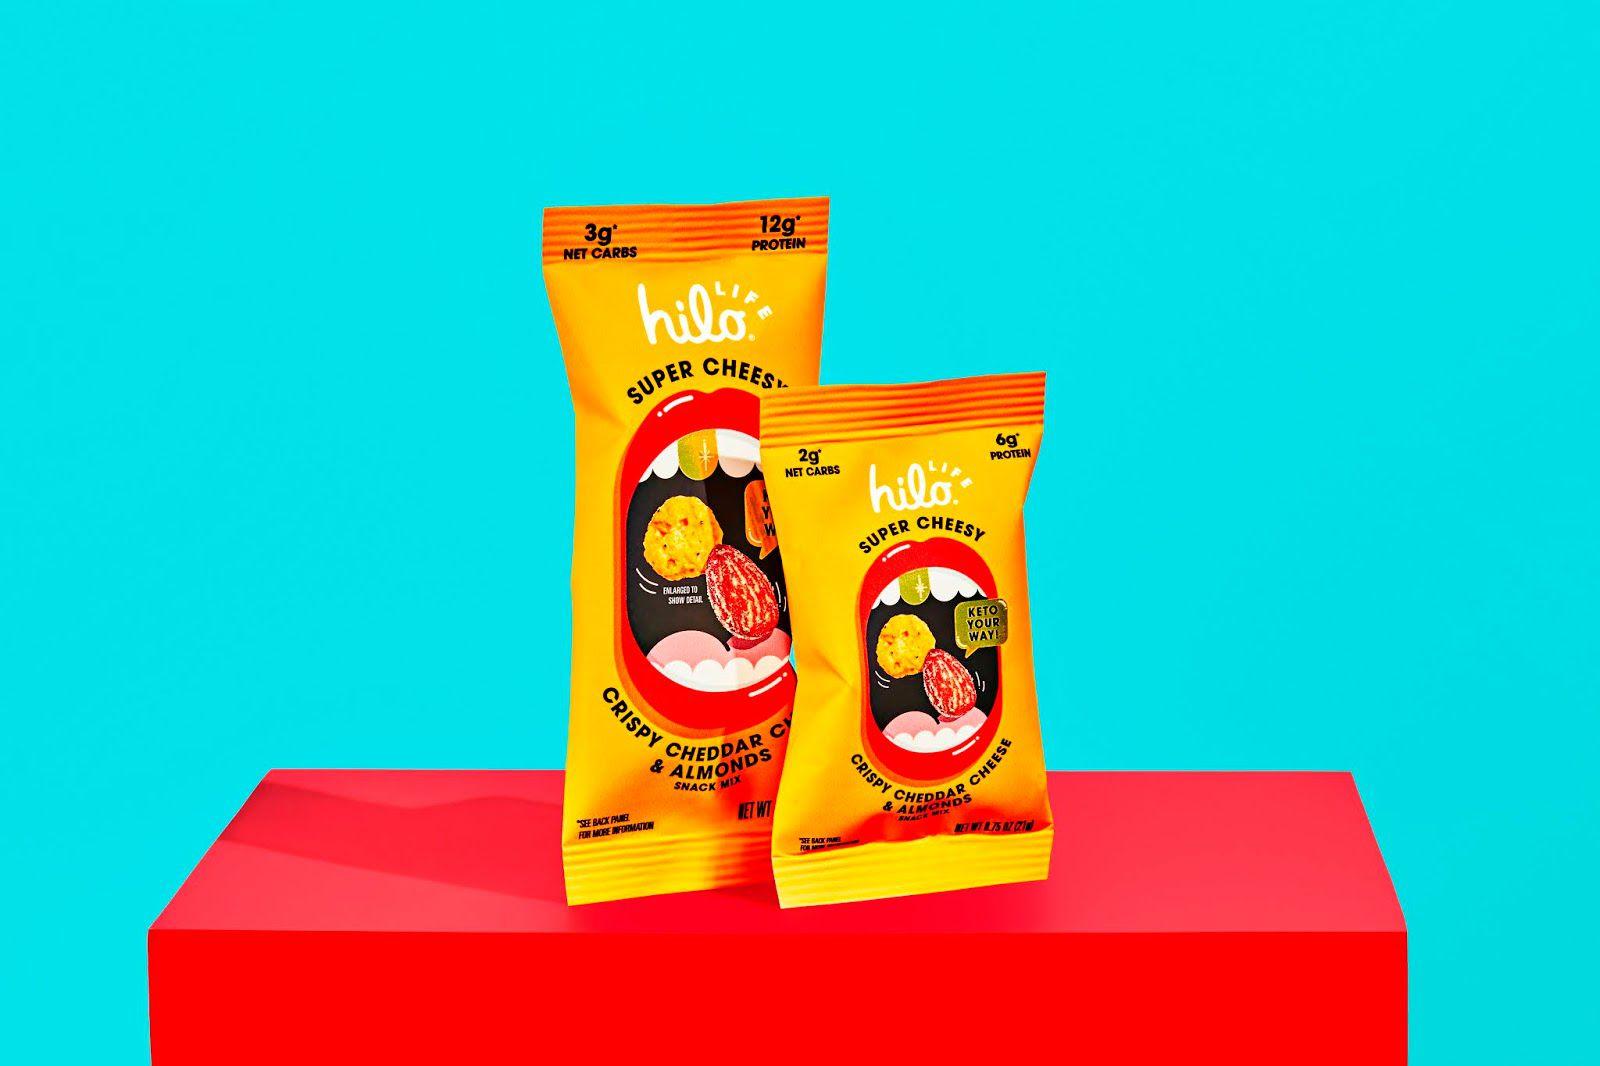 Hilo Life (chips keto à base de farine d'amande) I Design : Hilo Life, Etats-Unis (mars 2021)